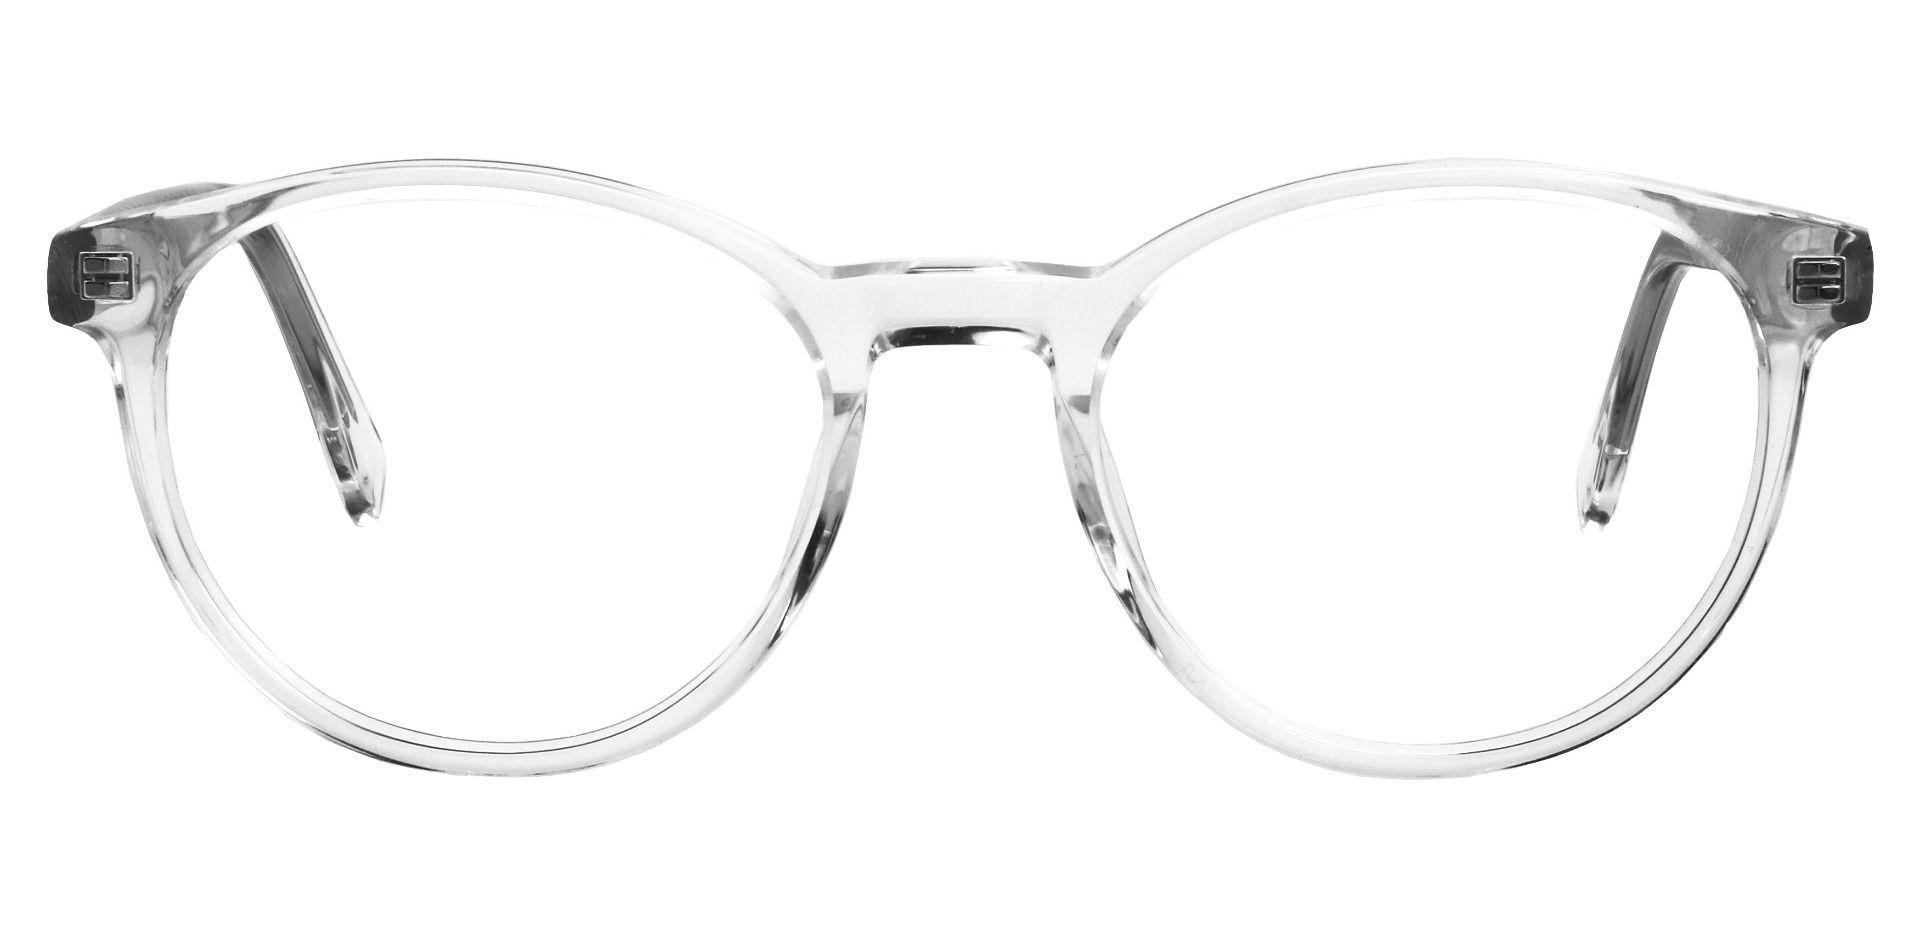 Stellar Oval Prescription Glasses - Clear